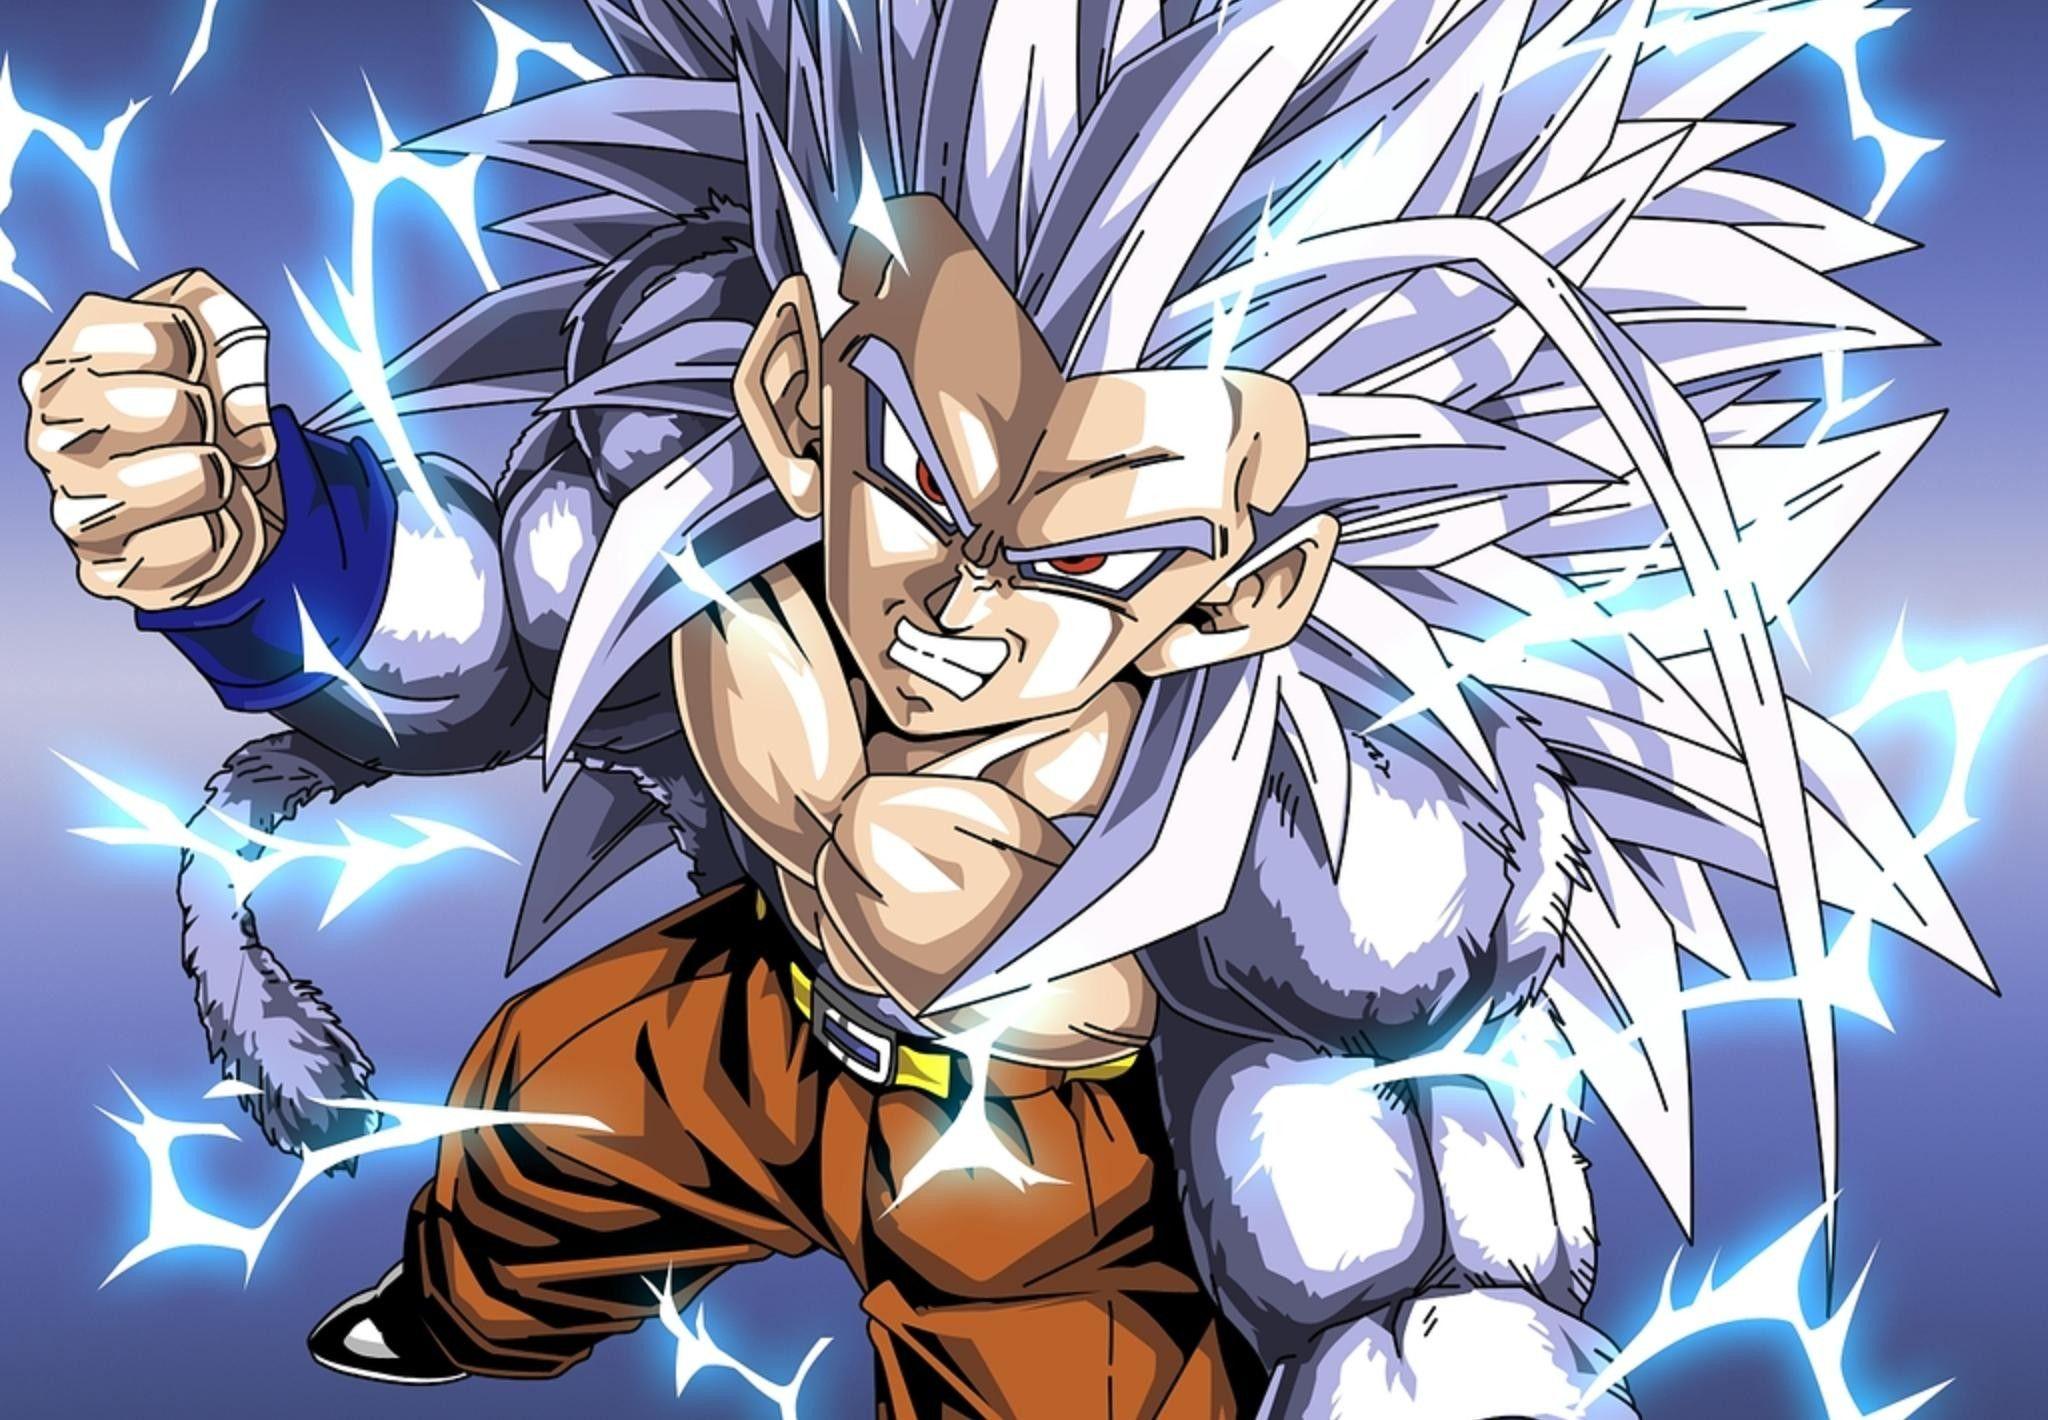 Wallpaper Dragon Ball Z Kamehameha 71 Goku Kamehameha Wallpapers On Wallpaperplay Goku Kamehameha Wallpapers 65 Background Pictures Dragon Ball Z 4k Ultra Hd